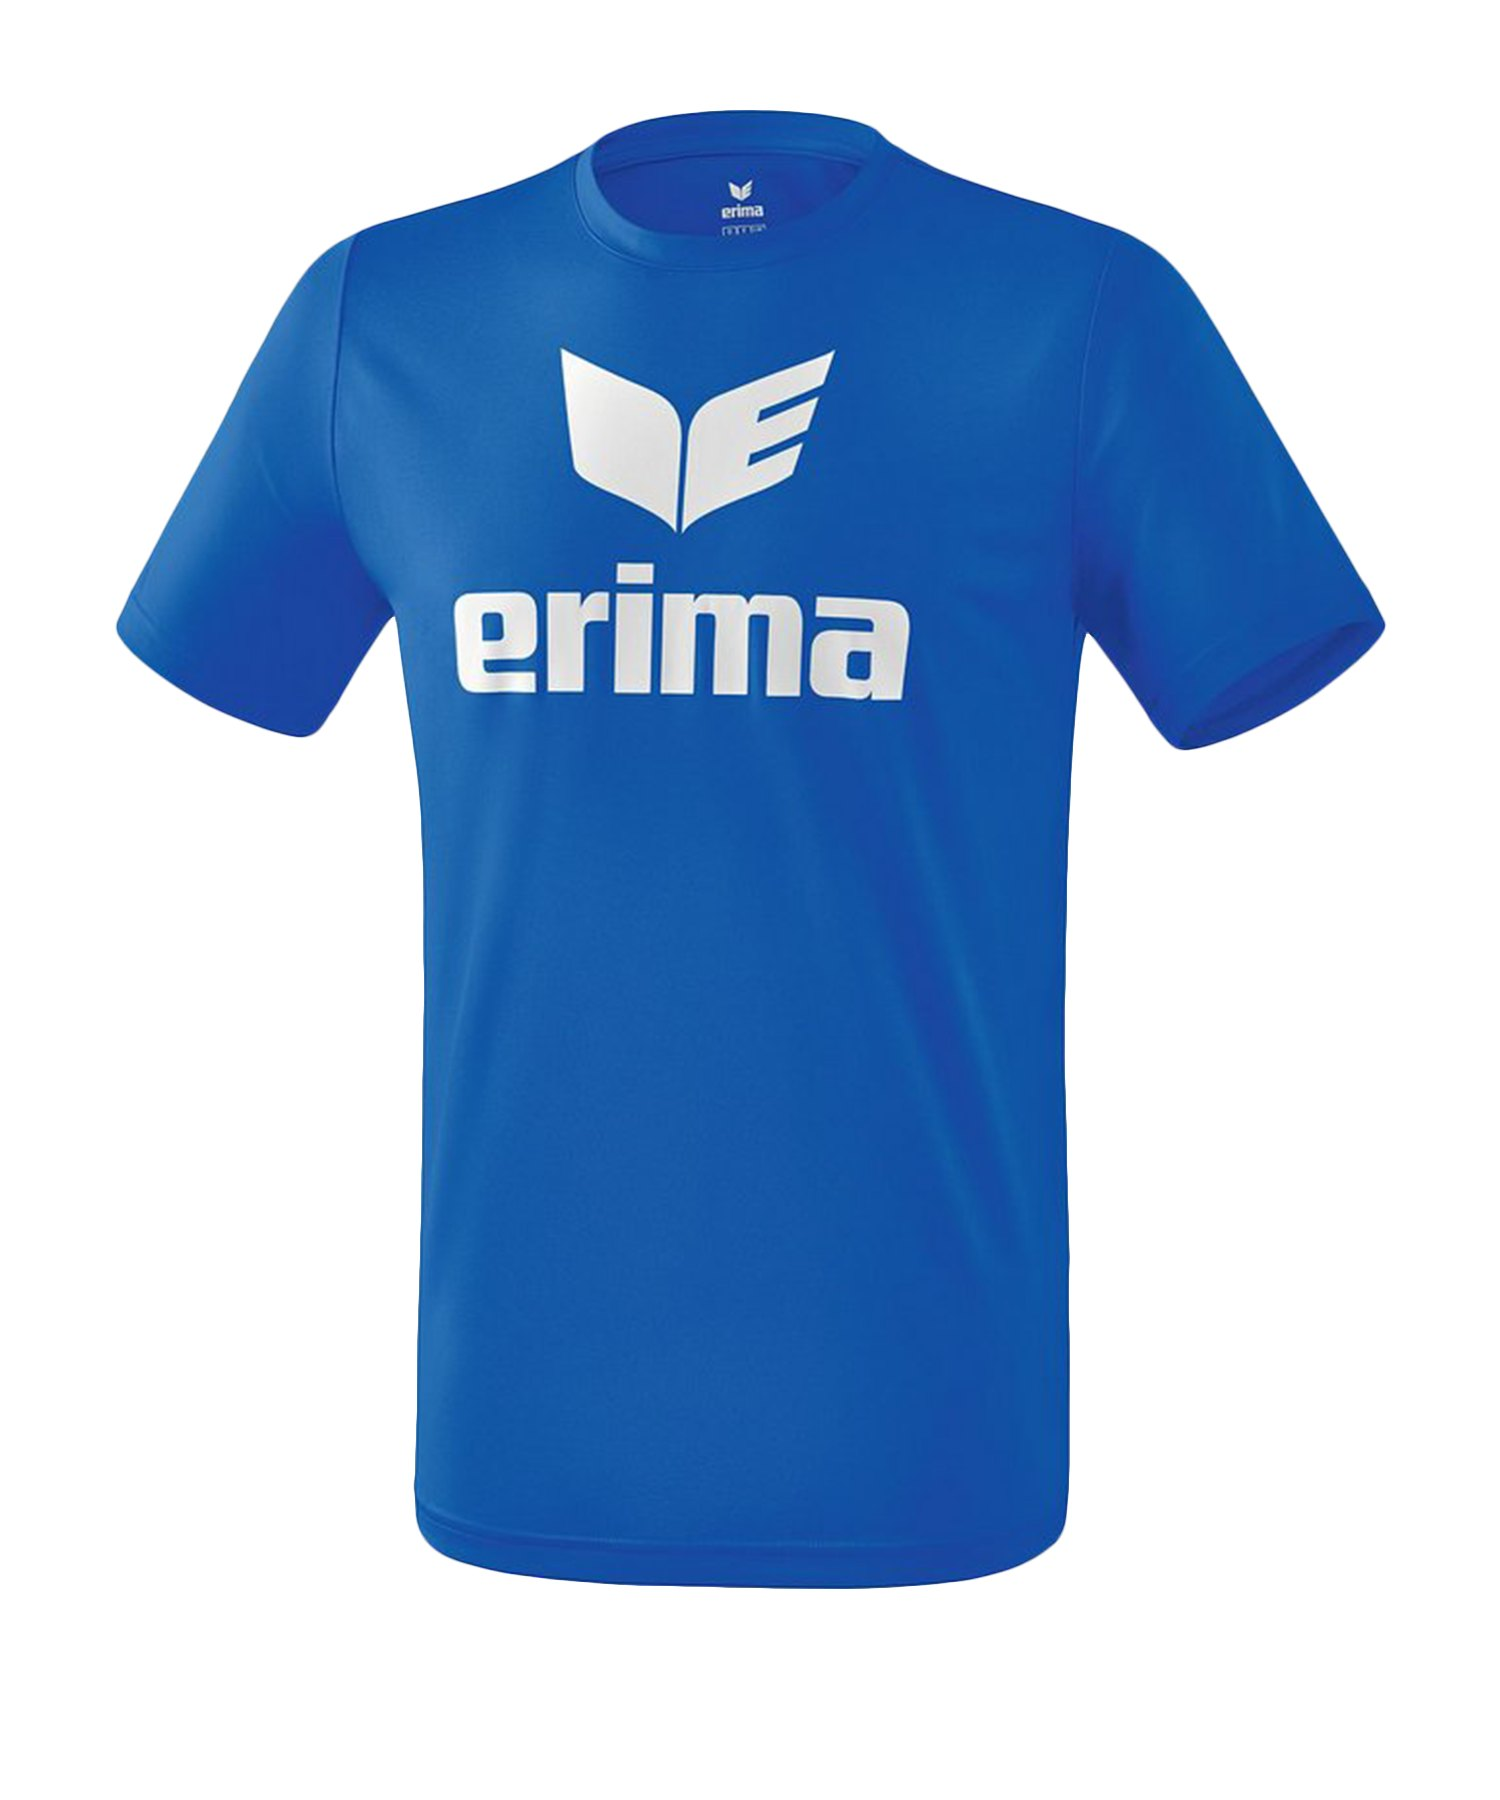 Erima Funktions Promo T-Shirt Kids Blau Weiss - Blau